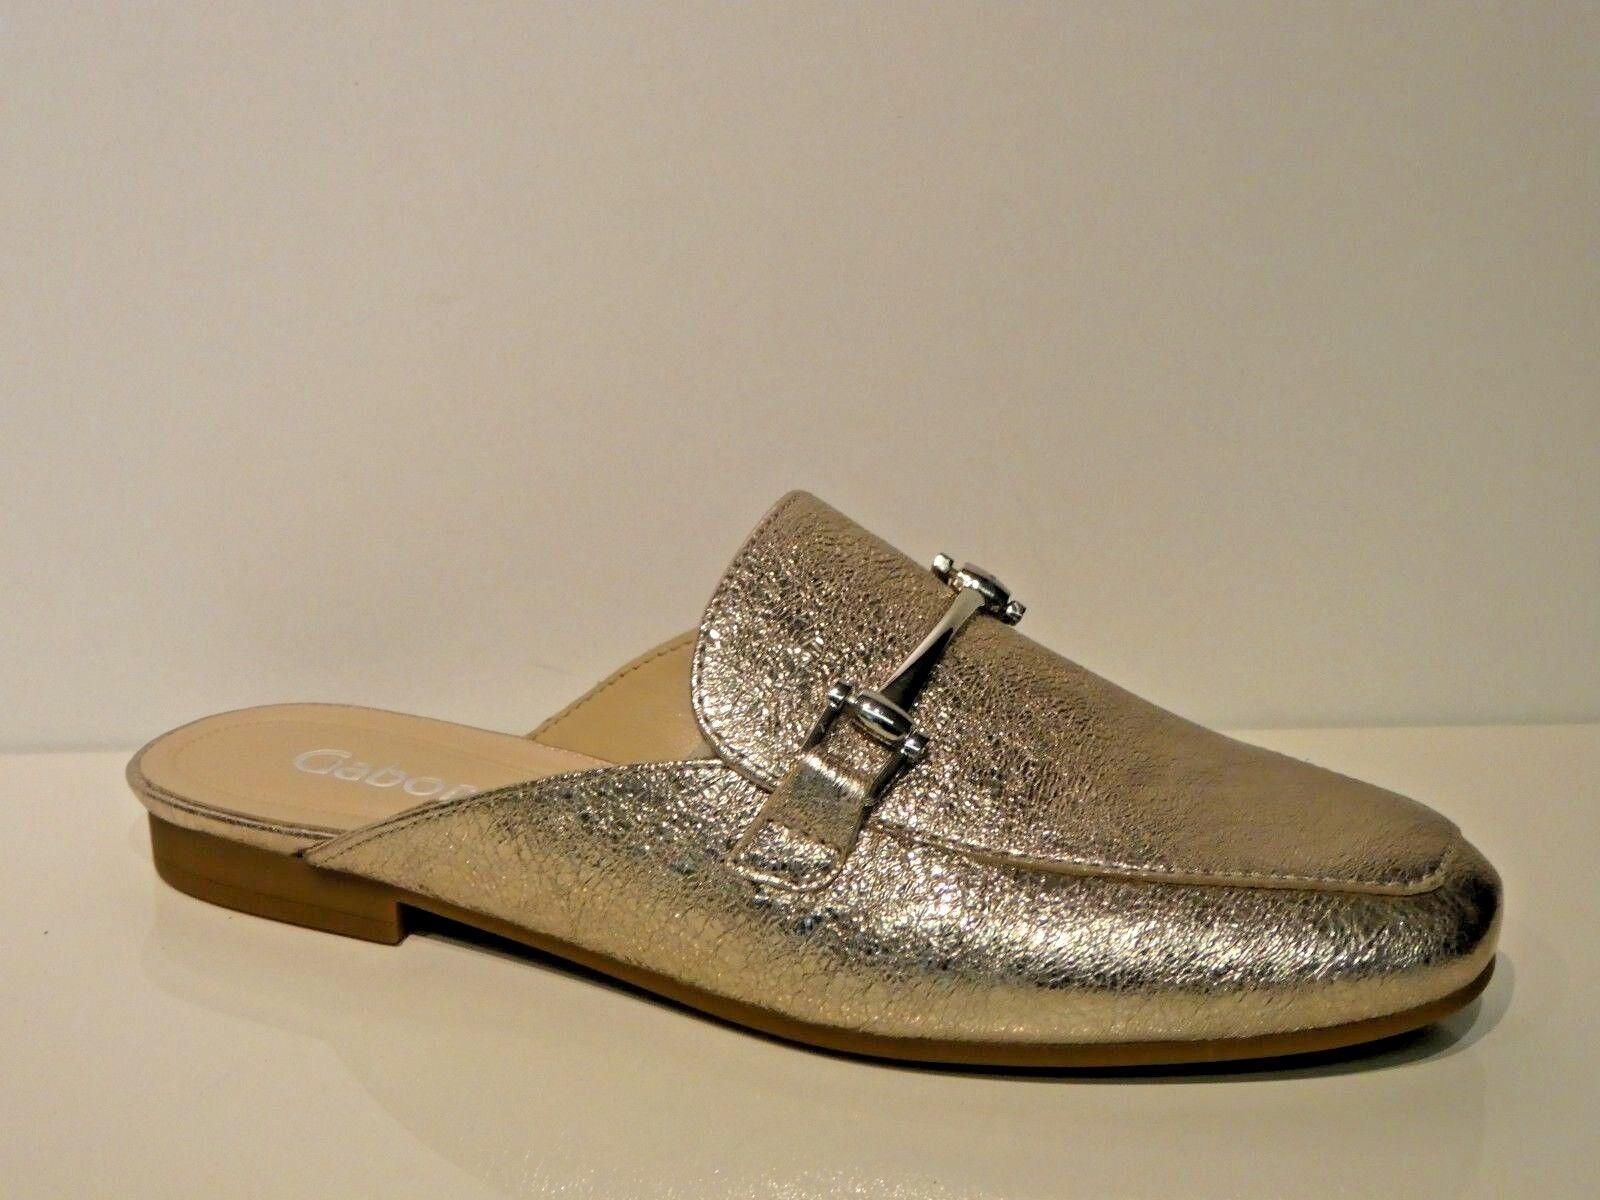 Gabor Sandalen Slipper Clogs Sabots Mules Loafers muschel Crash metallic Leder